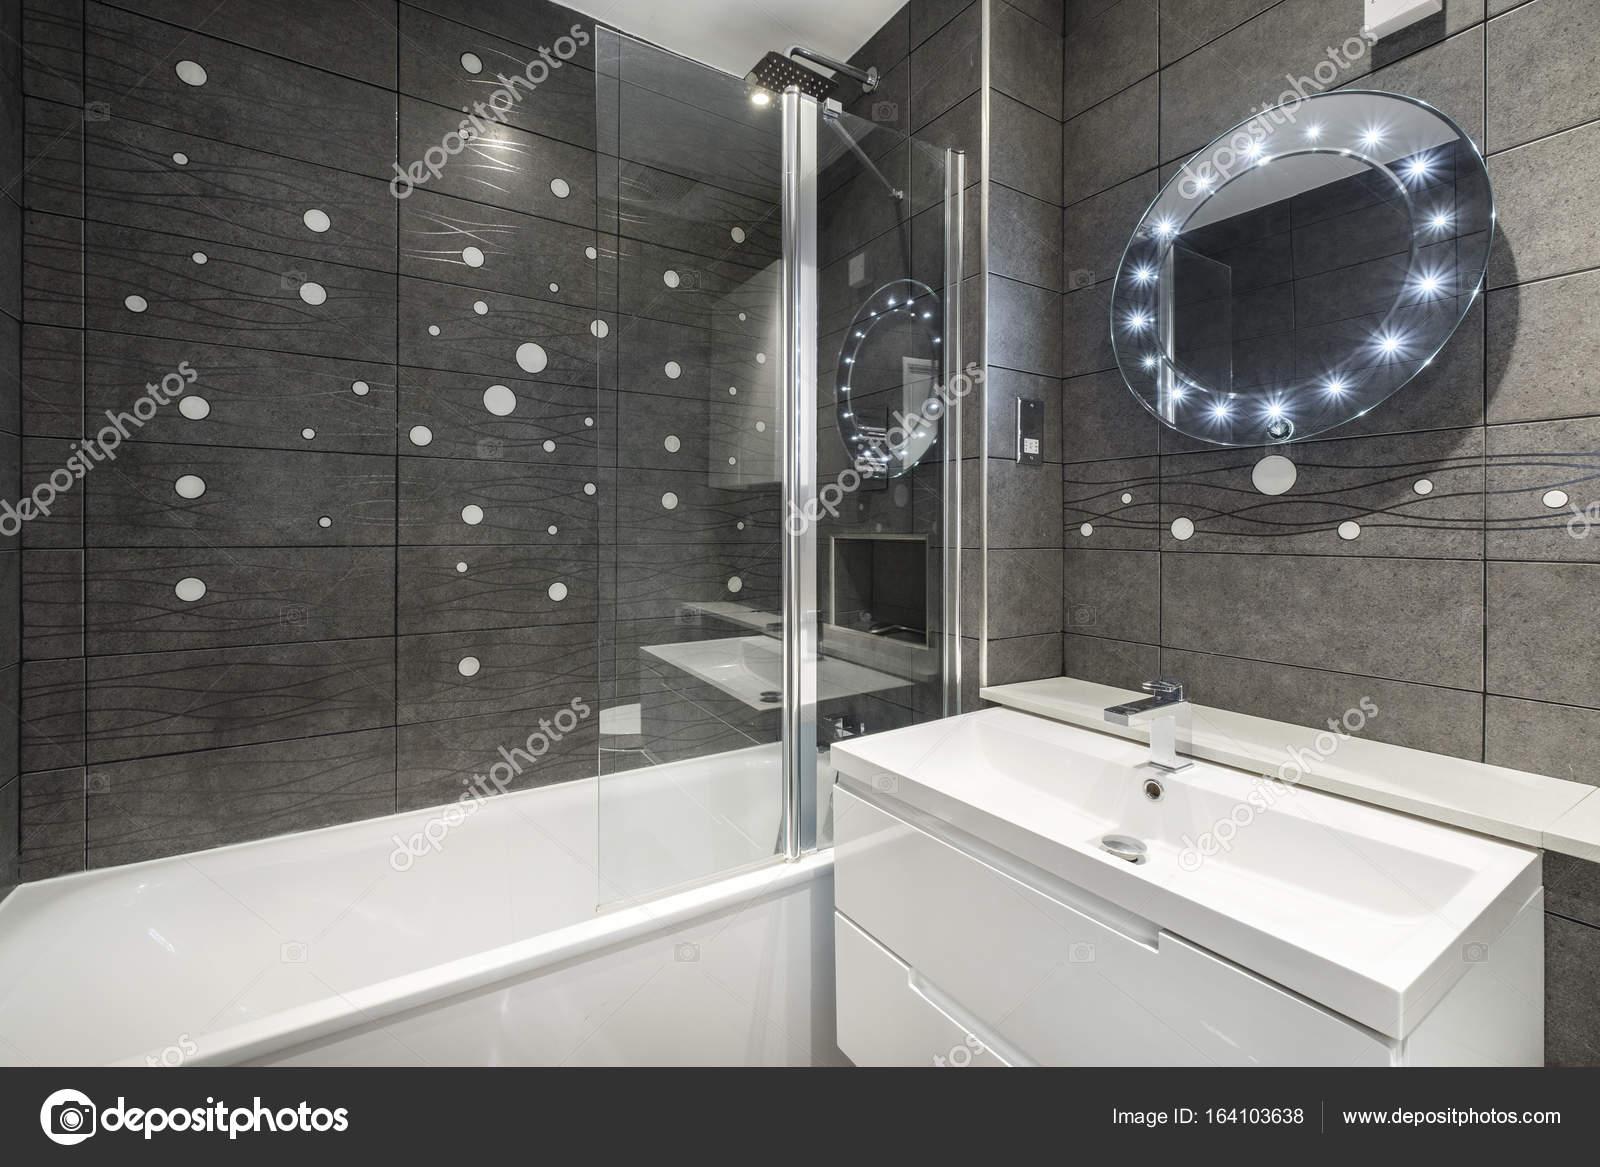 Moderne Luxus-Badezimmer — Stockfoto © jrphoto #164103638